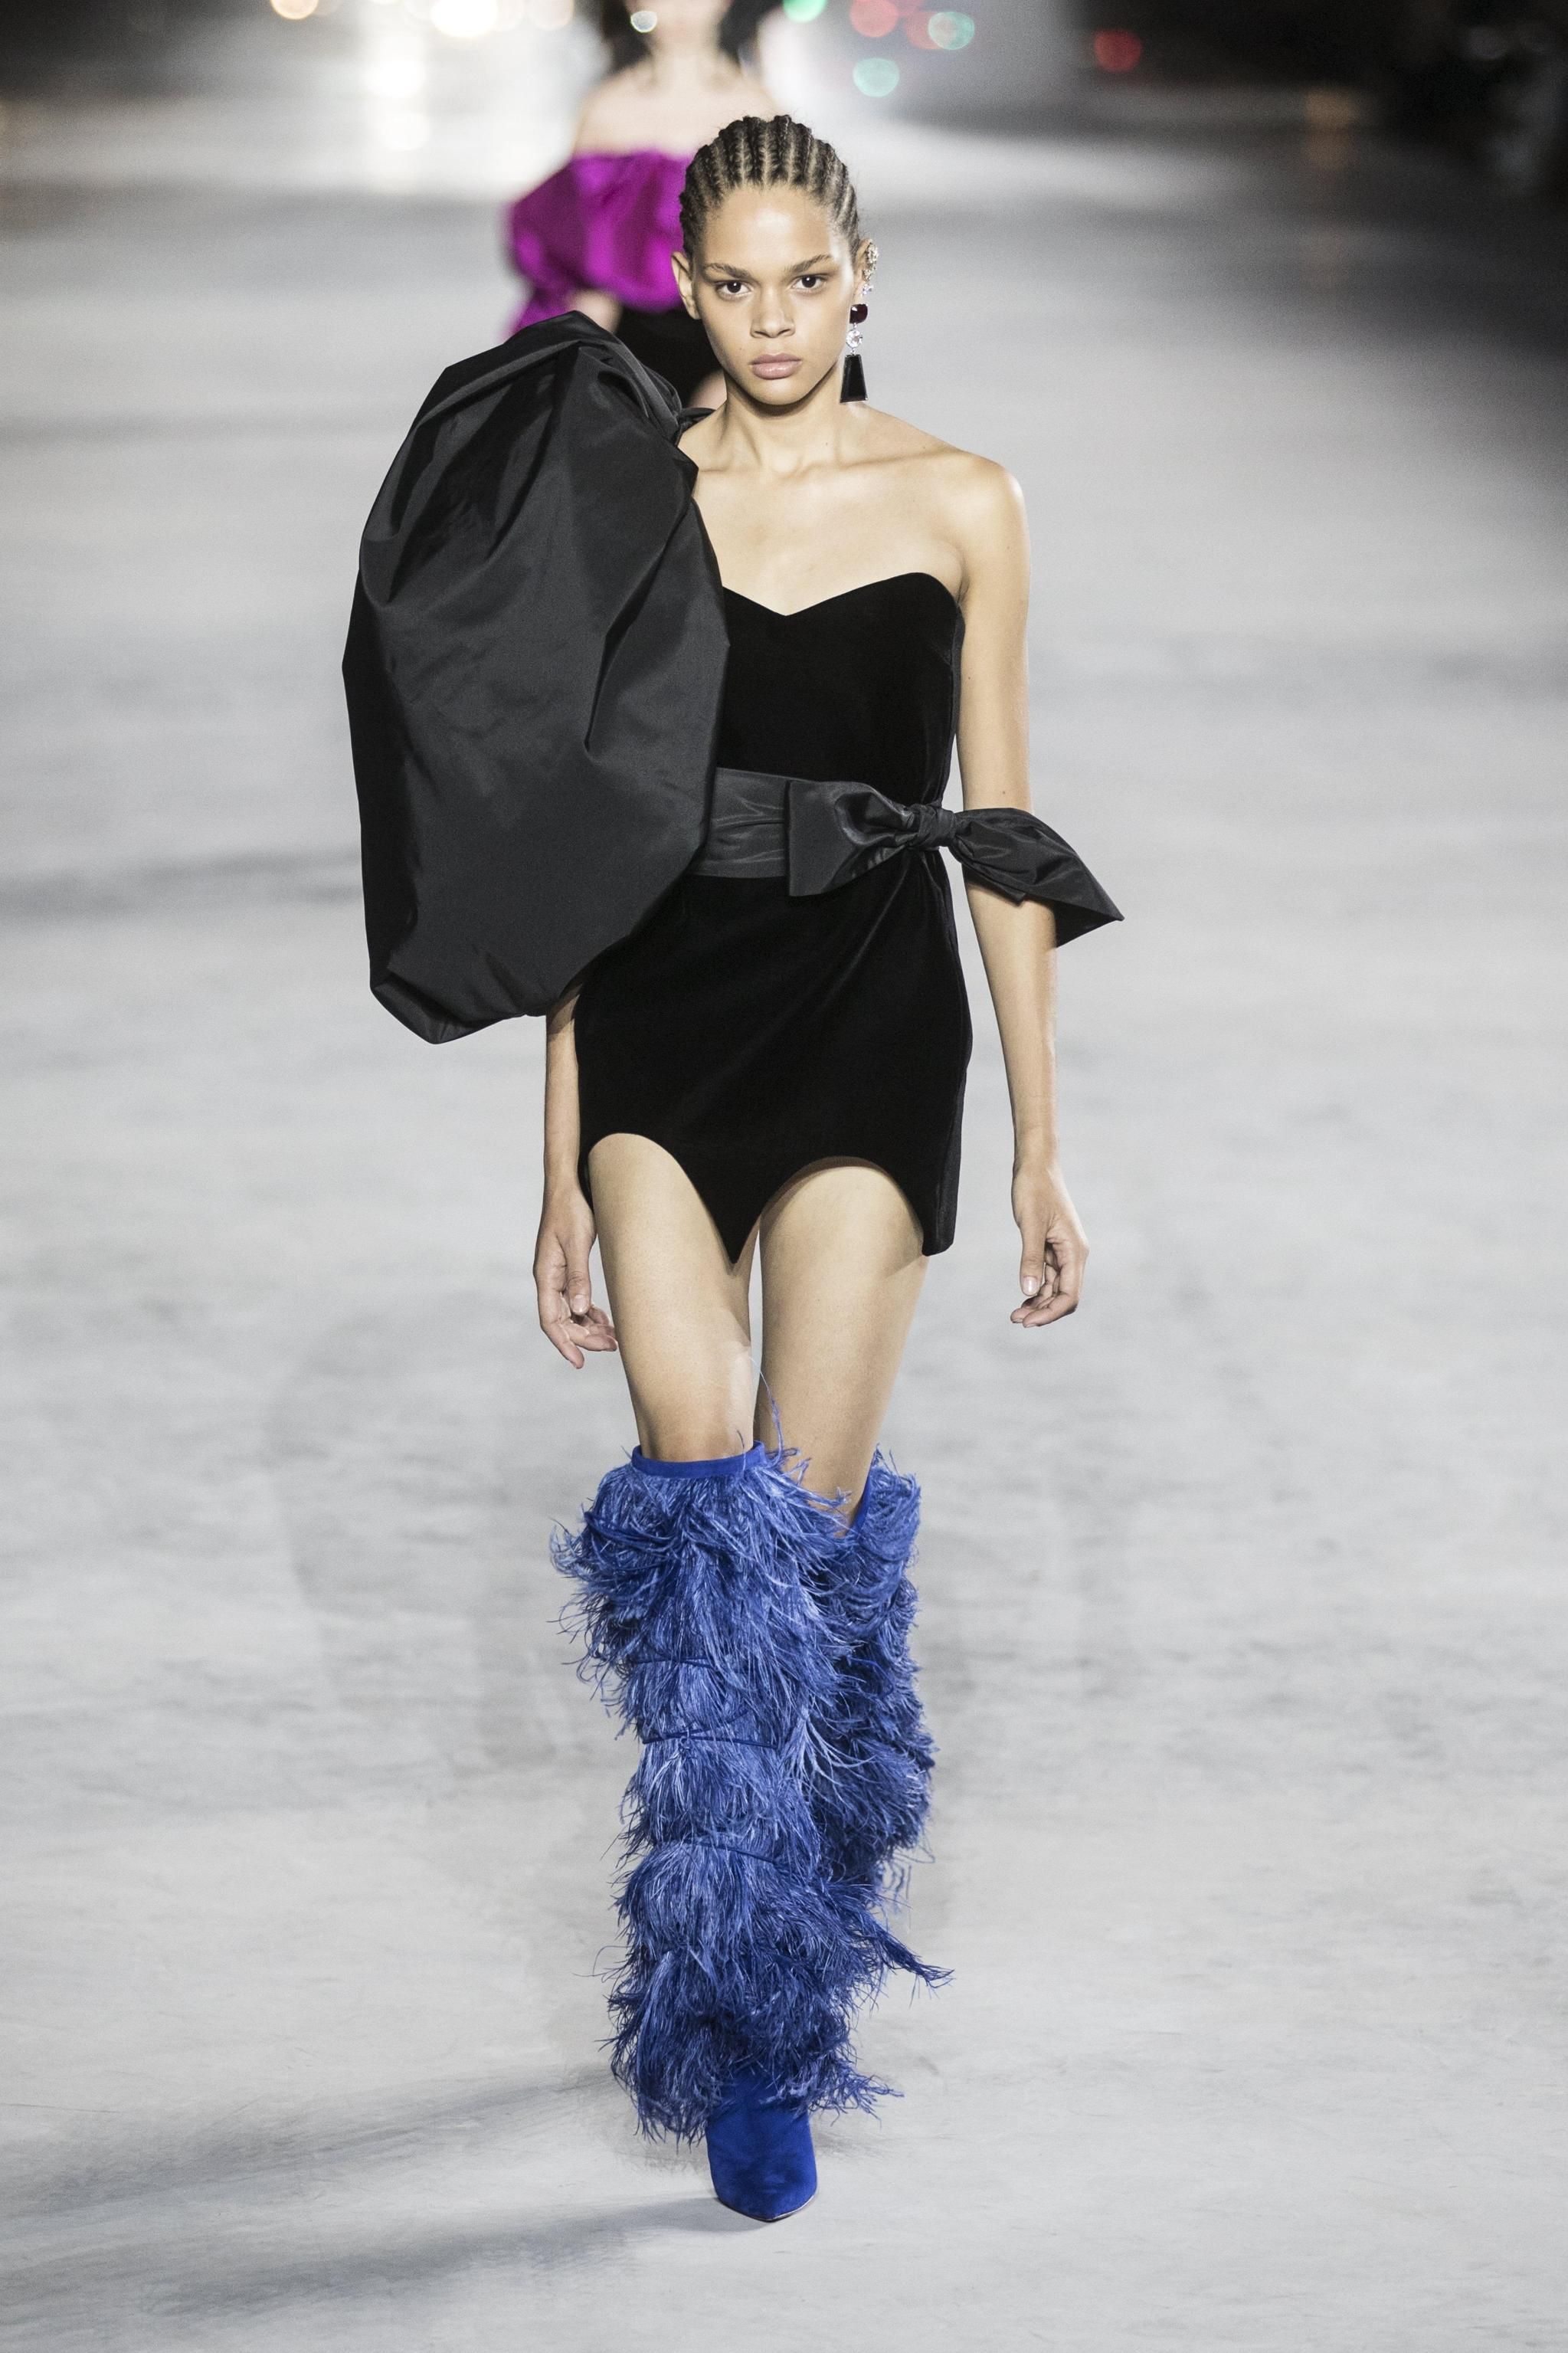 Saint Laurent Runway Paris Fashion Week Ready to Wear S/S 2018